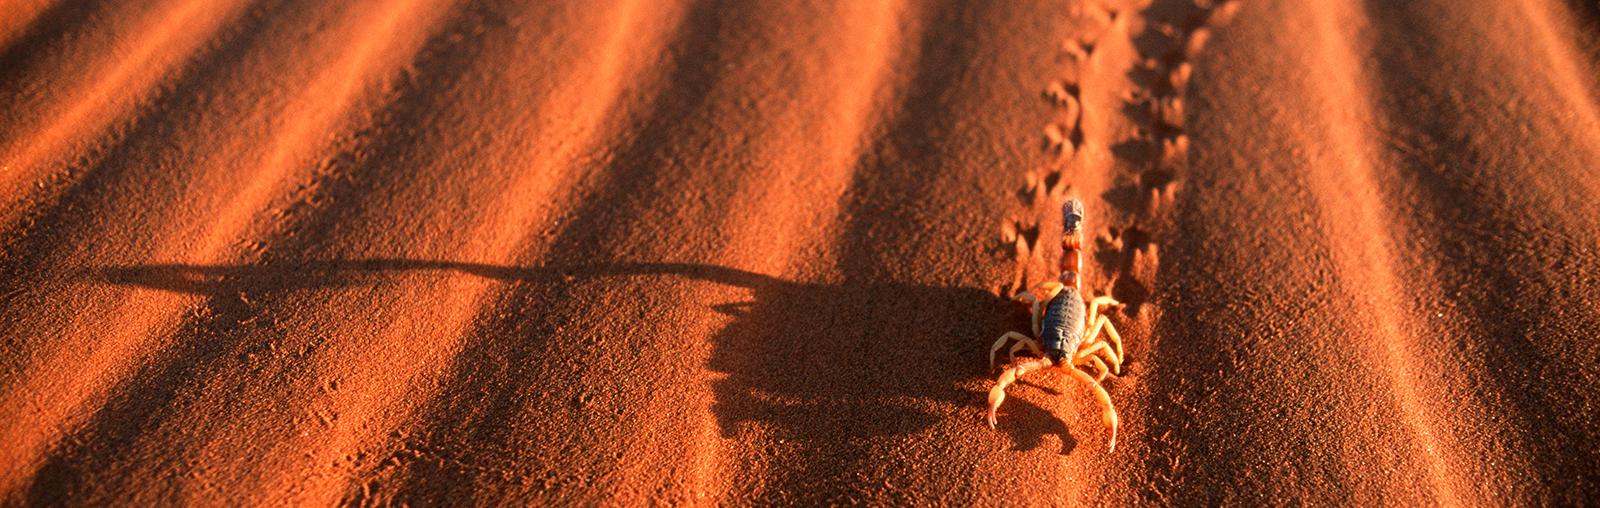 Scorpion & Tracks on a Rippled Dune